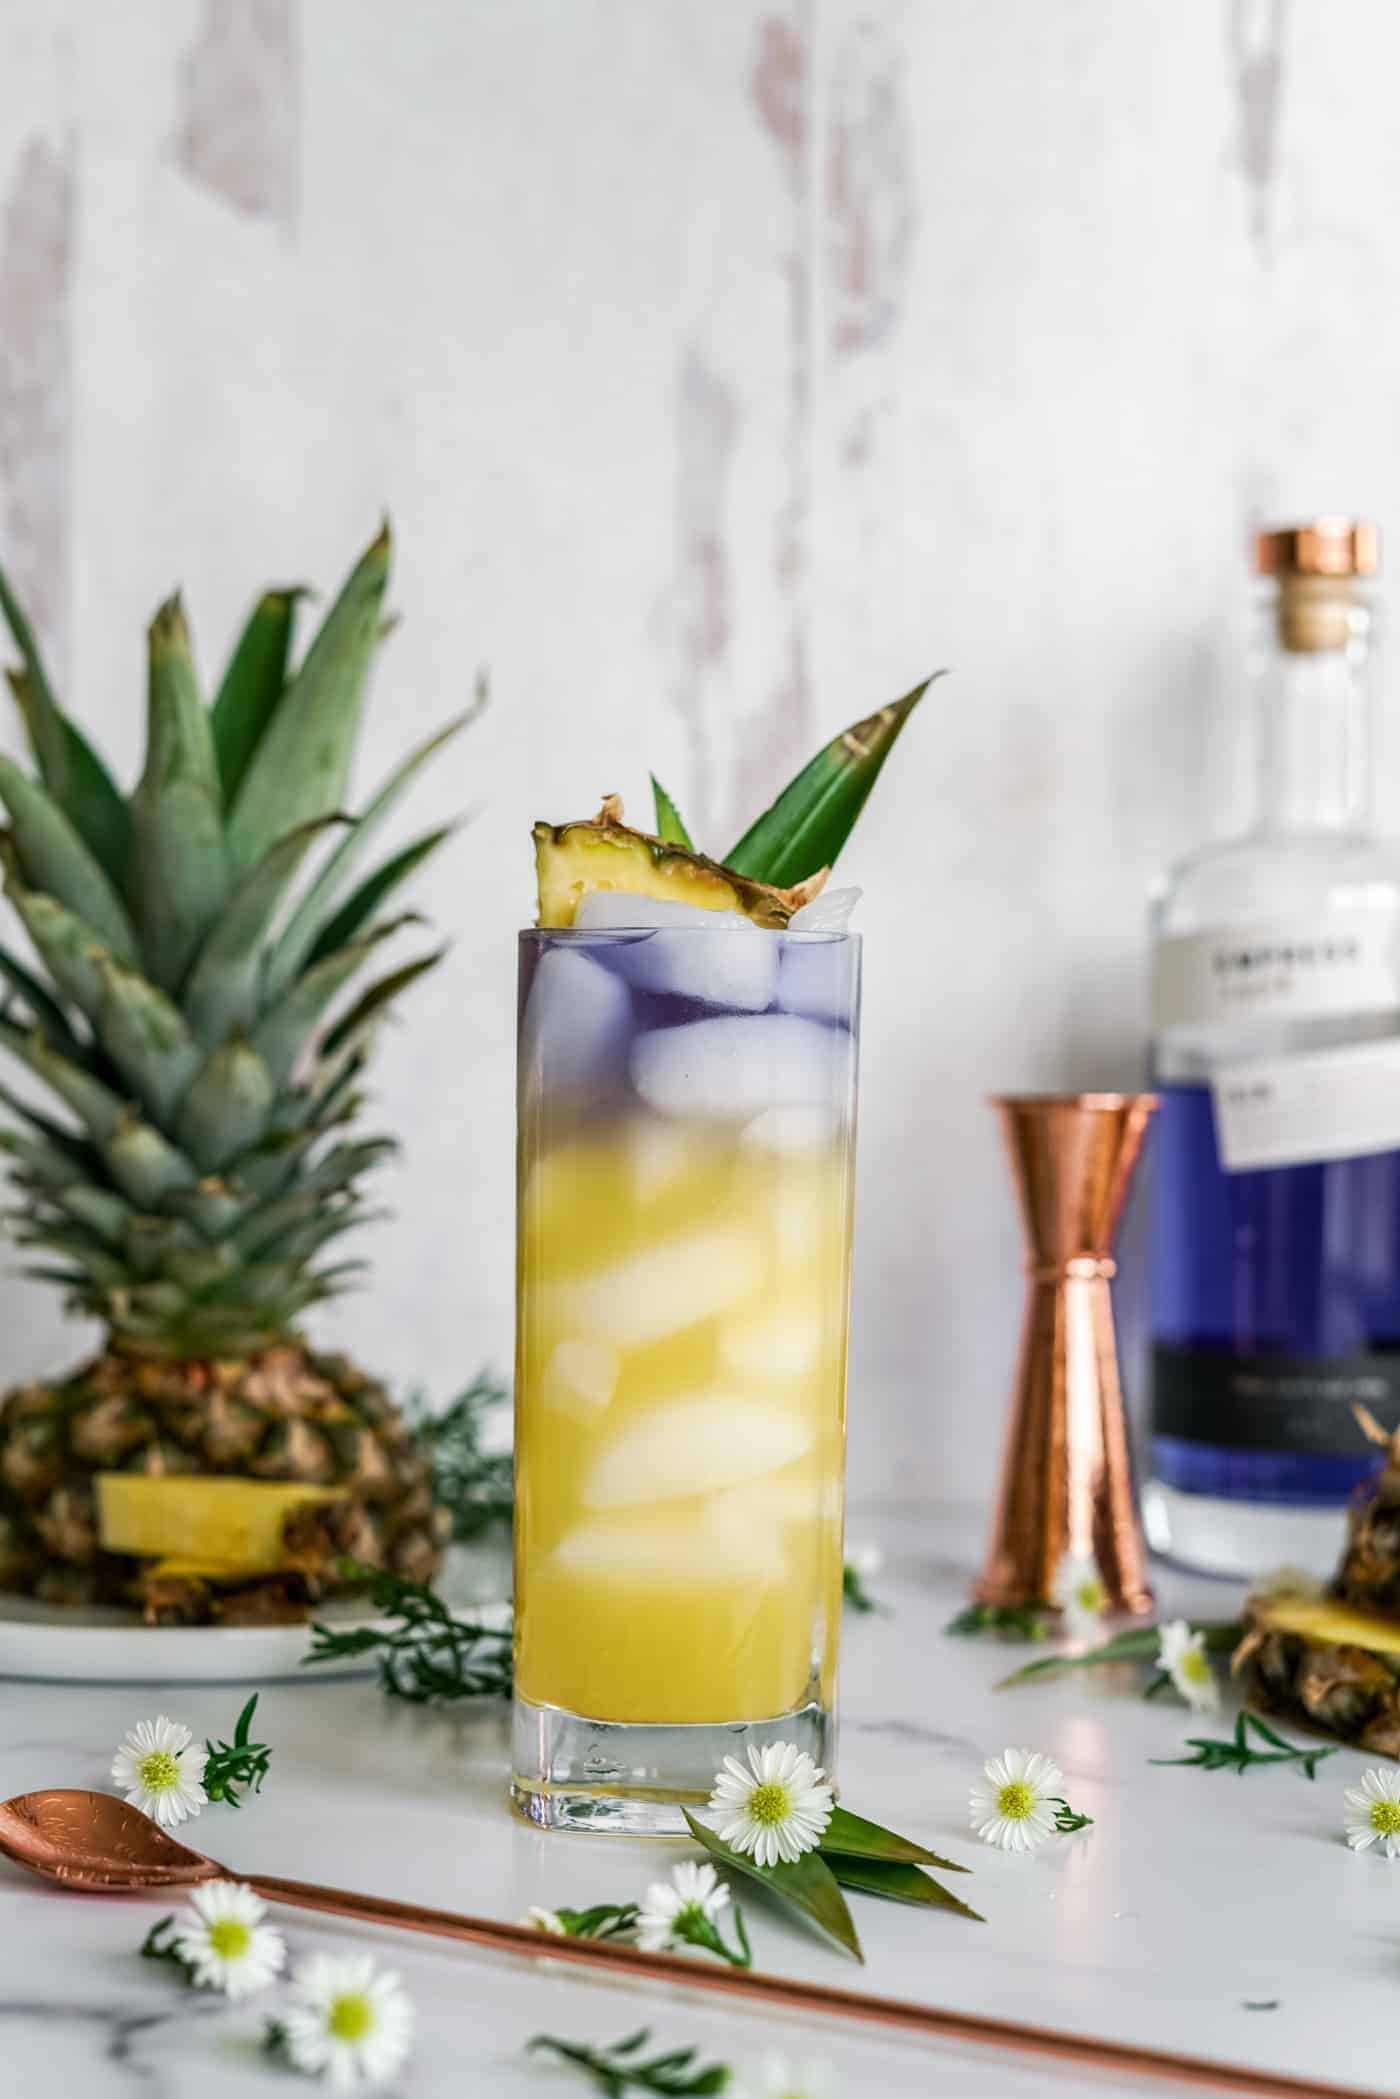 Royal Hawaiian Cocktail made with Empress 1908 Gin